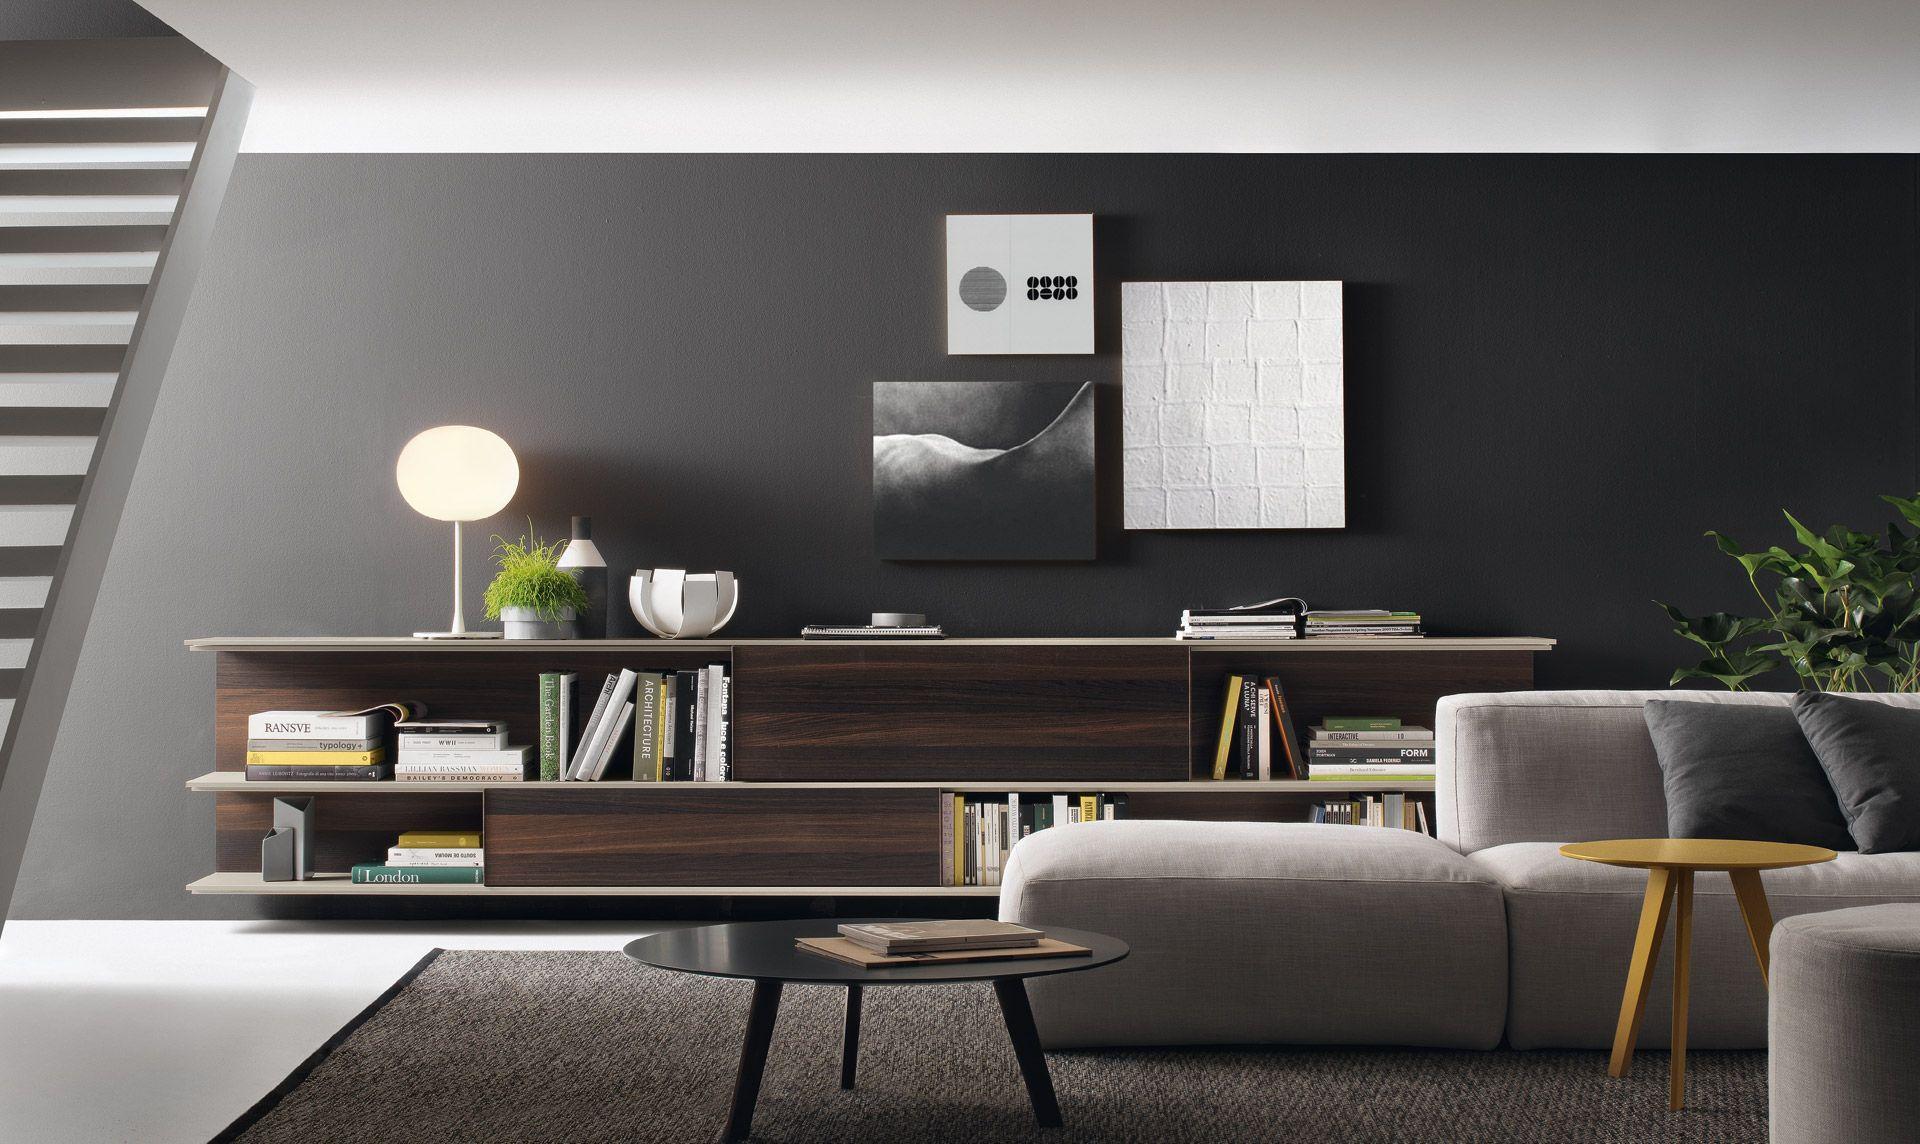 jesse - mobili arredamento design - wall units - online wall unit ... - Arredamento Design Living